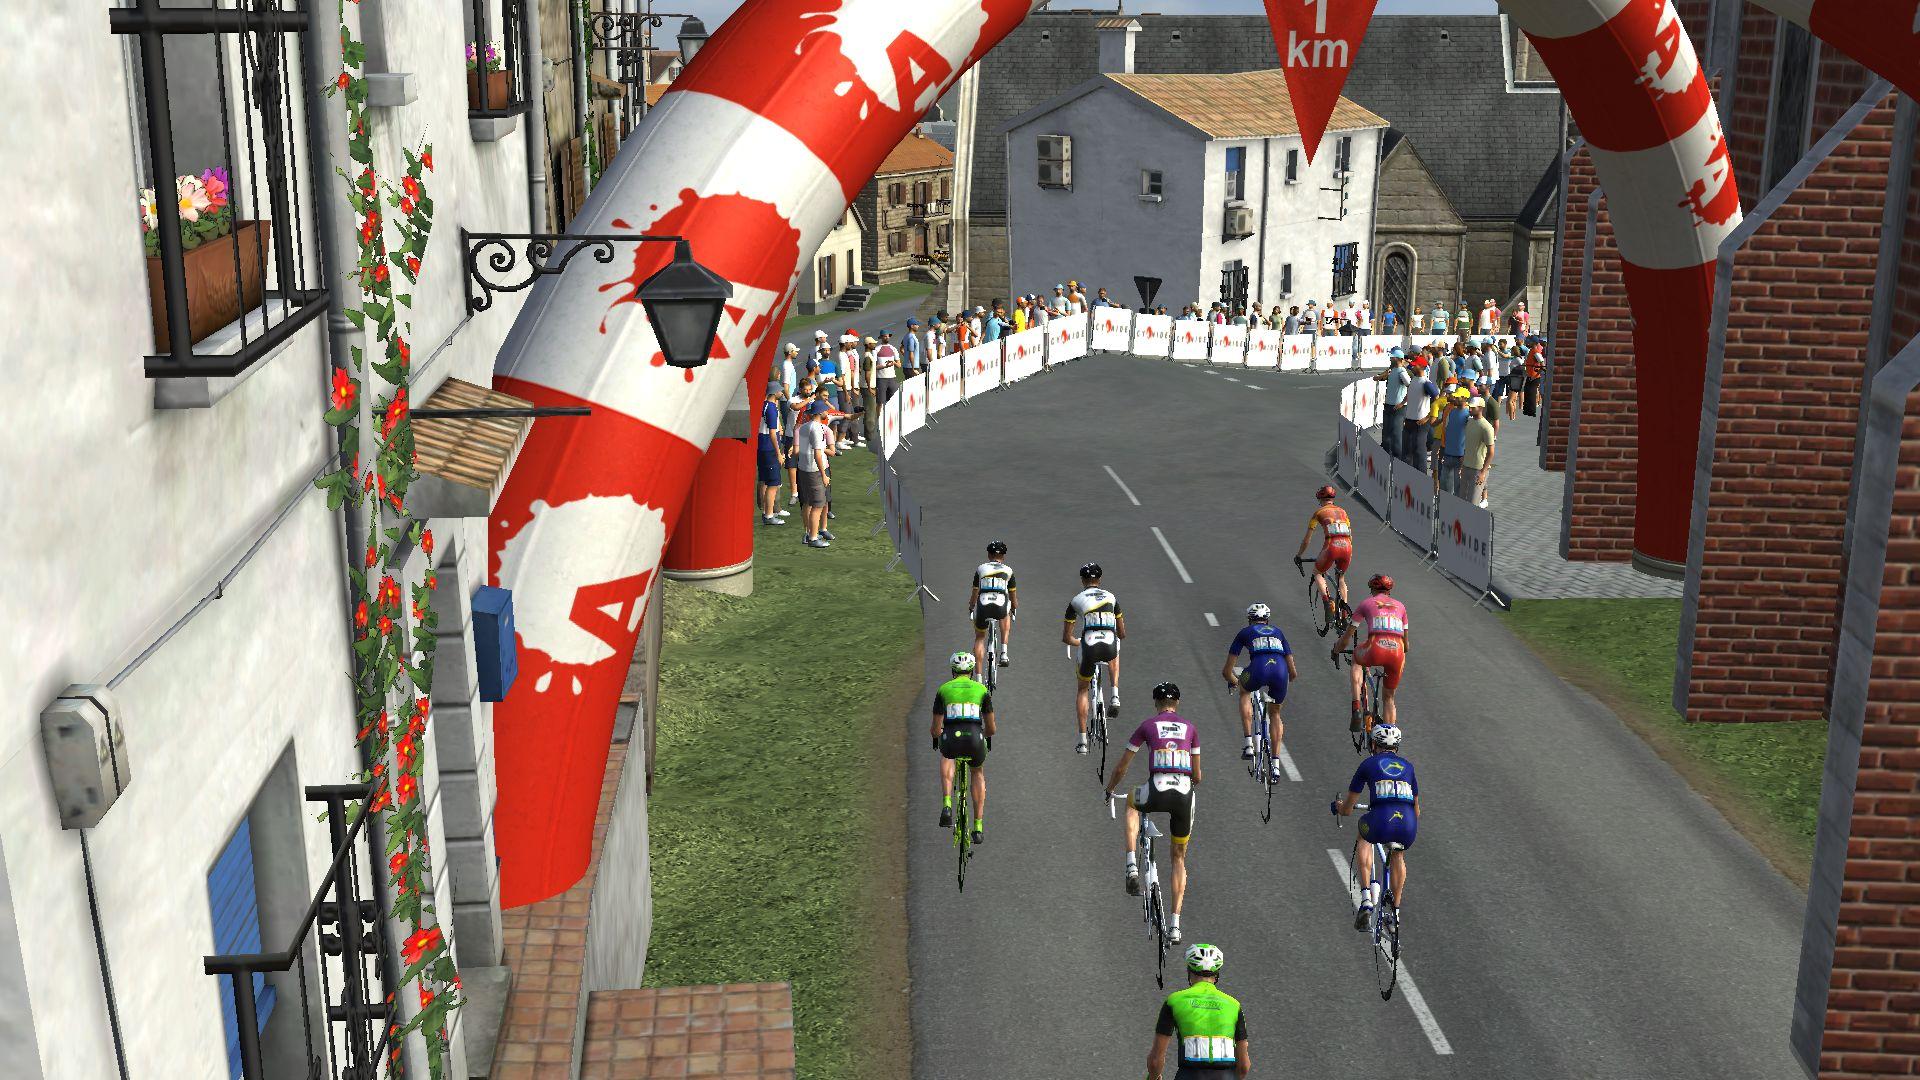 pcmdaily.com/images/mg/2019/Races/GTM/Giro/mg19_giro_12_PCM0148.jpg